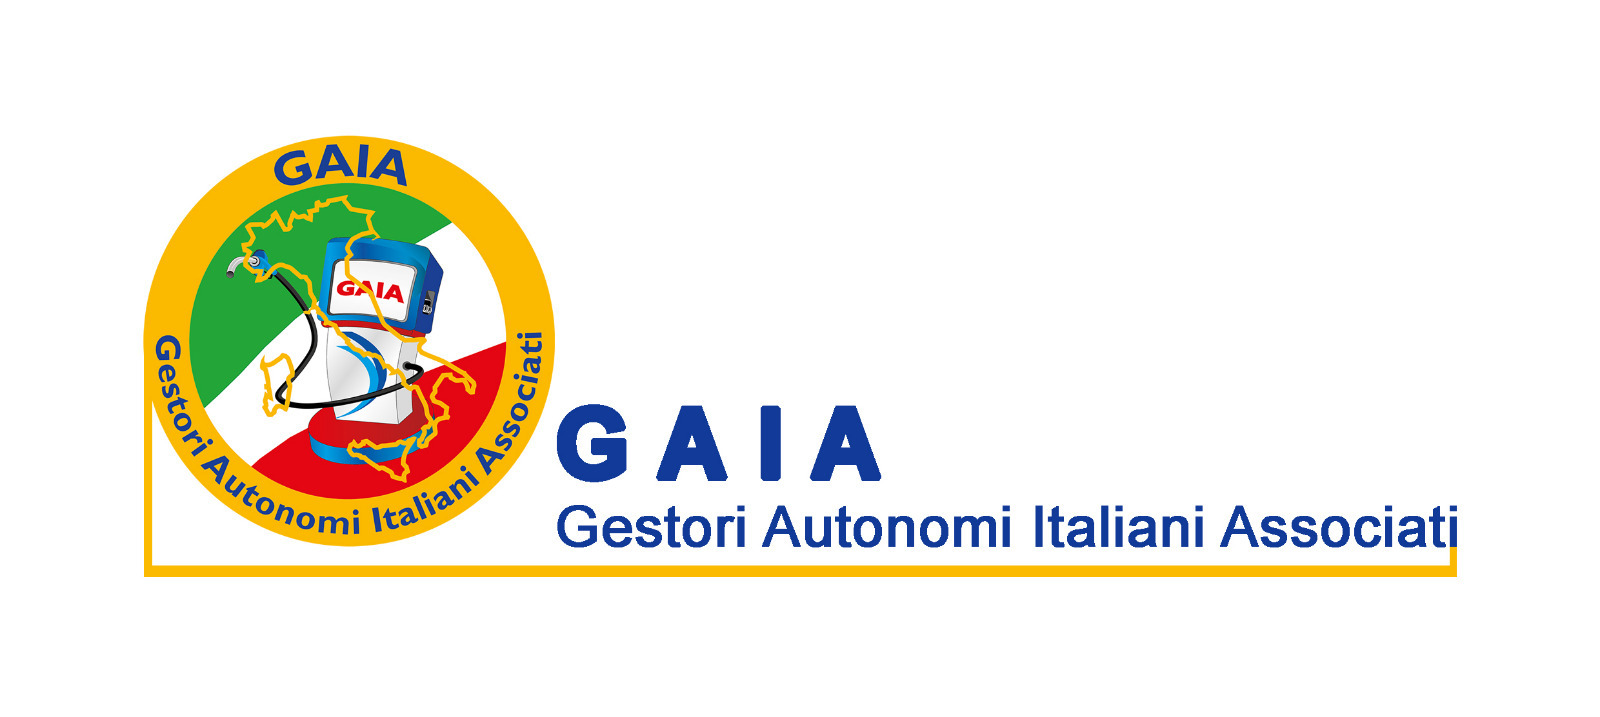 Comunicato Stampa AsNALI - GAIA - Gisc_Tv 11 - 01 - 2021